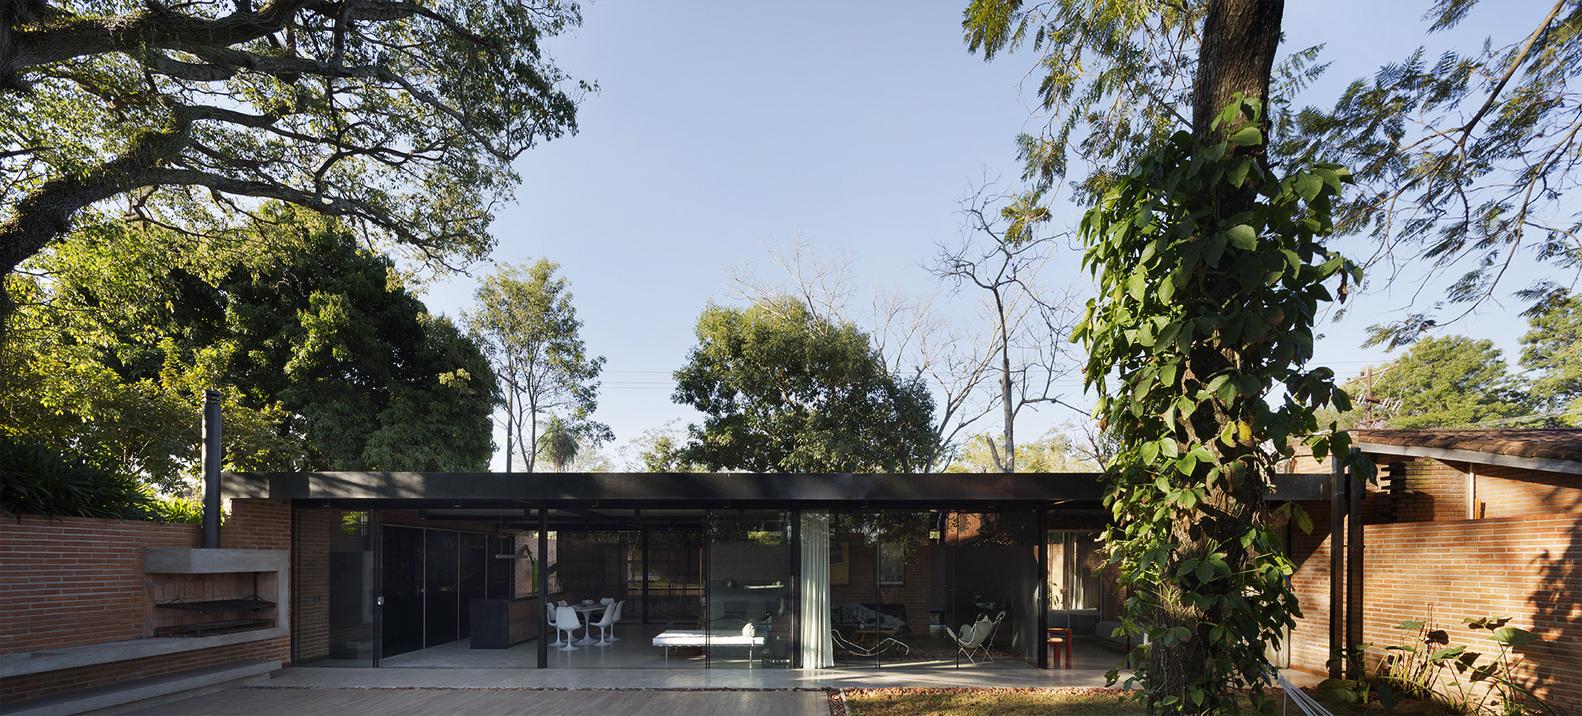 6_La Escondida House_Nou arquitectos_Inspirationist